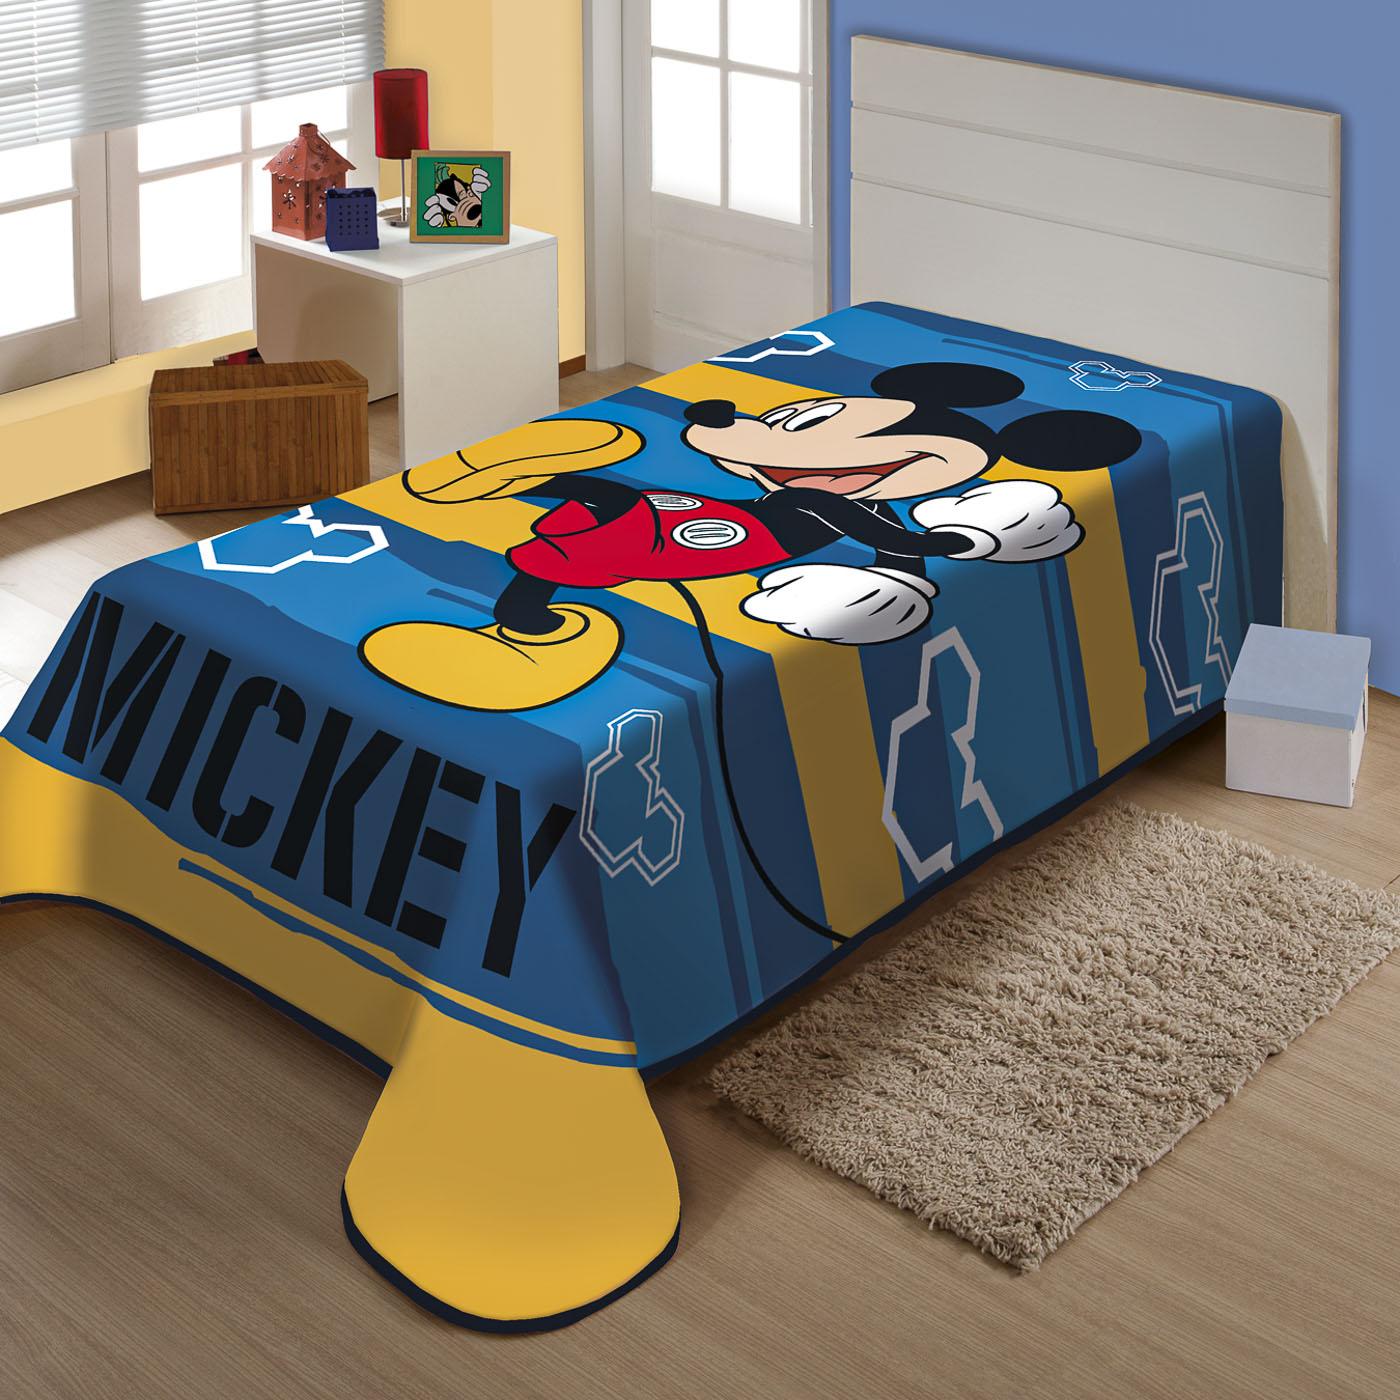 Cobertor Solteiro Juvenil Raschel Jolitex Disney Mickey Feliz